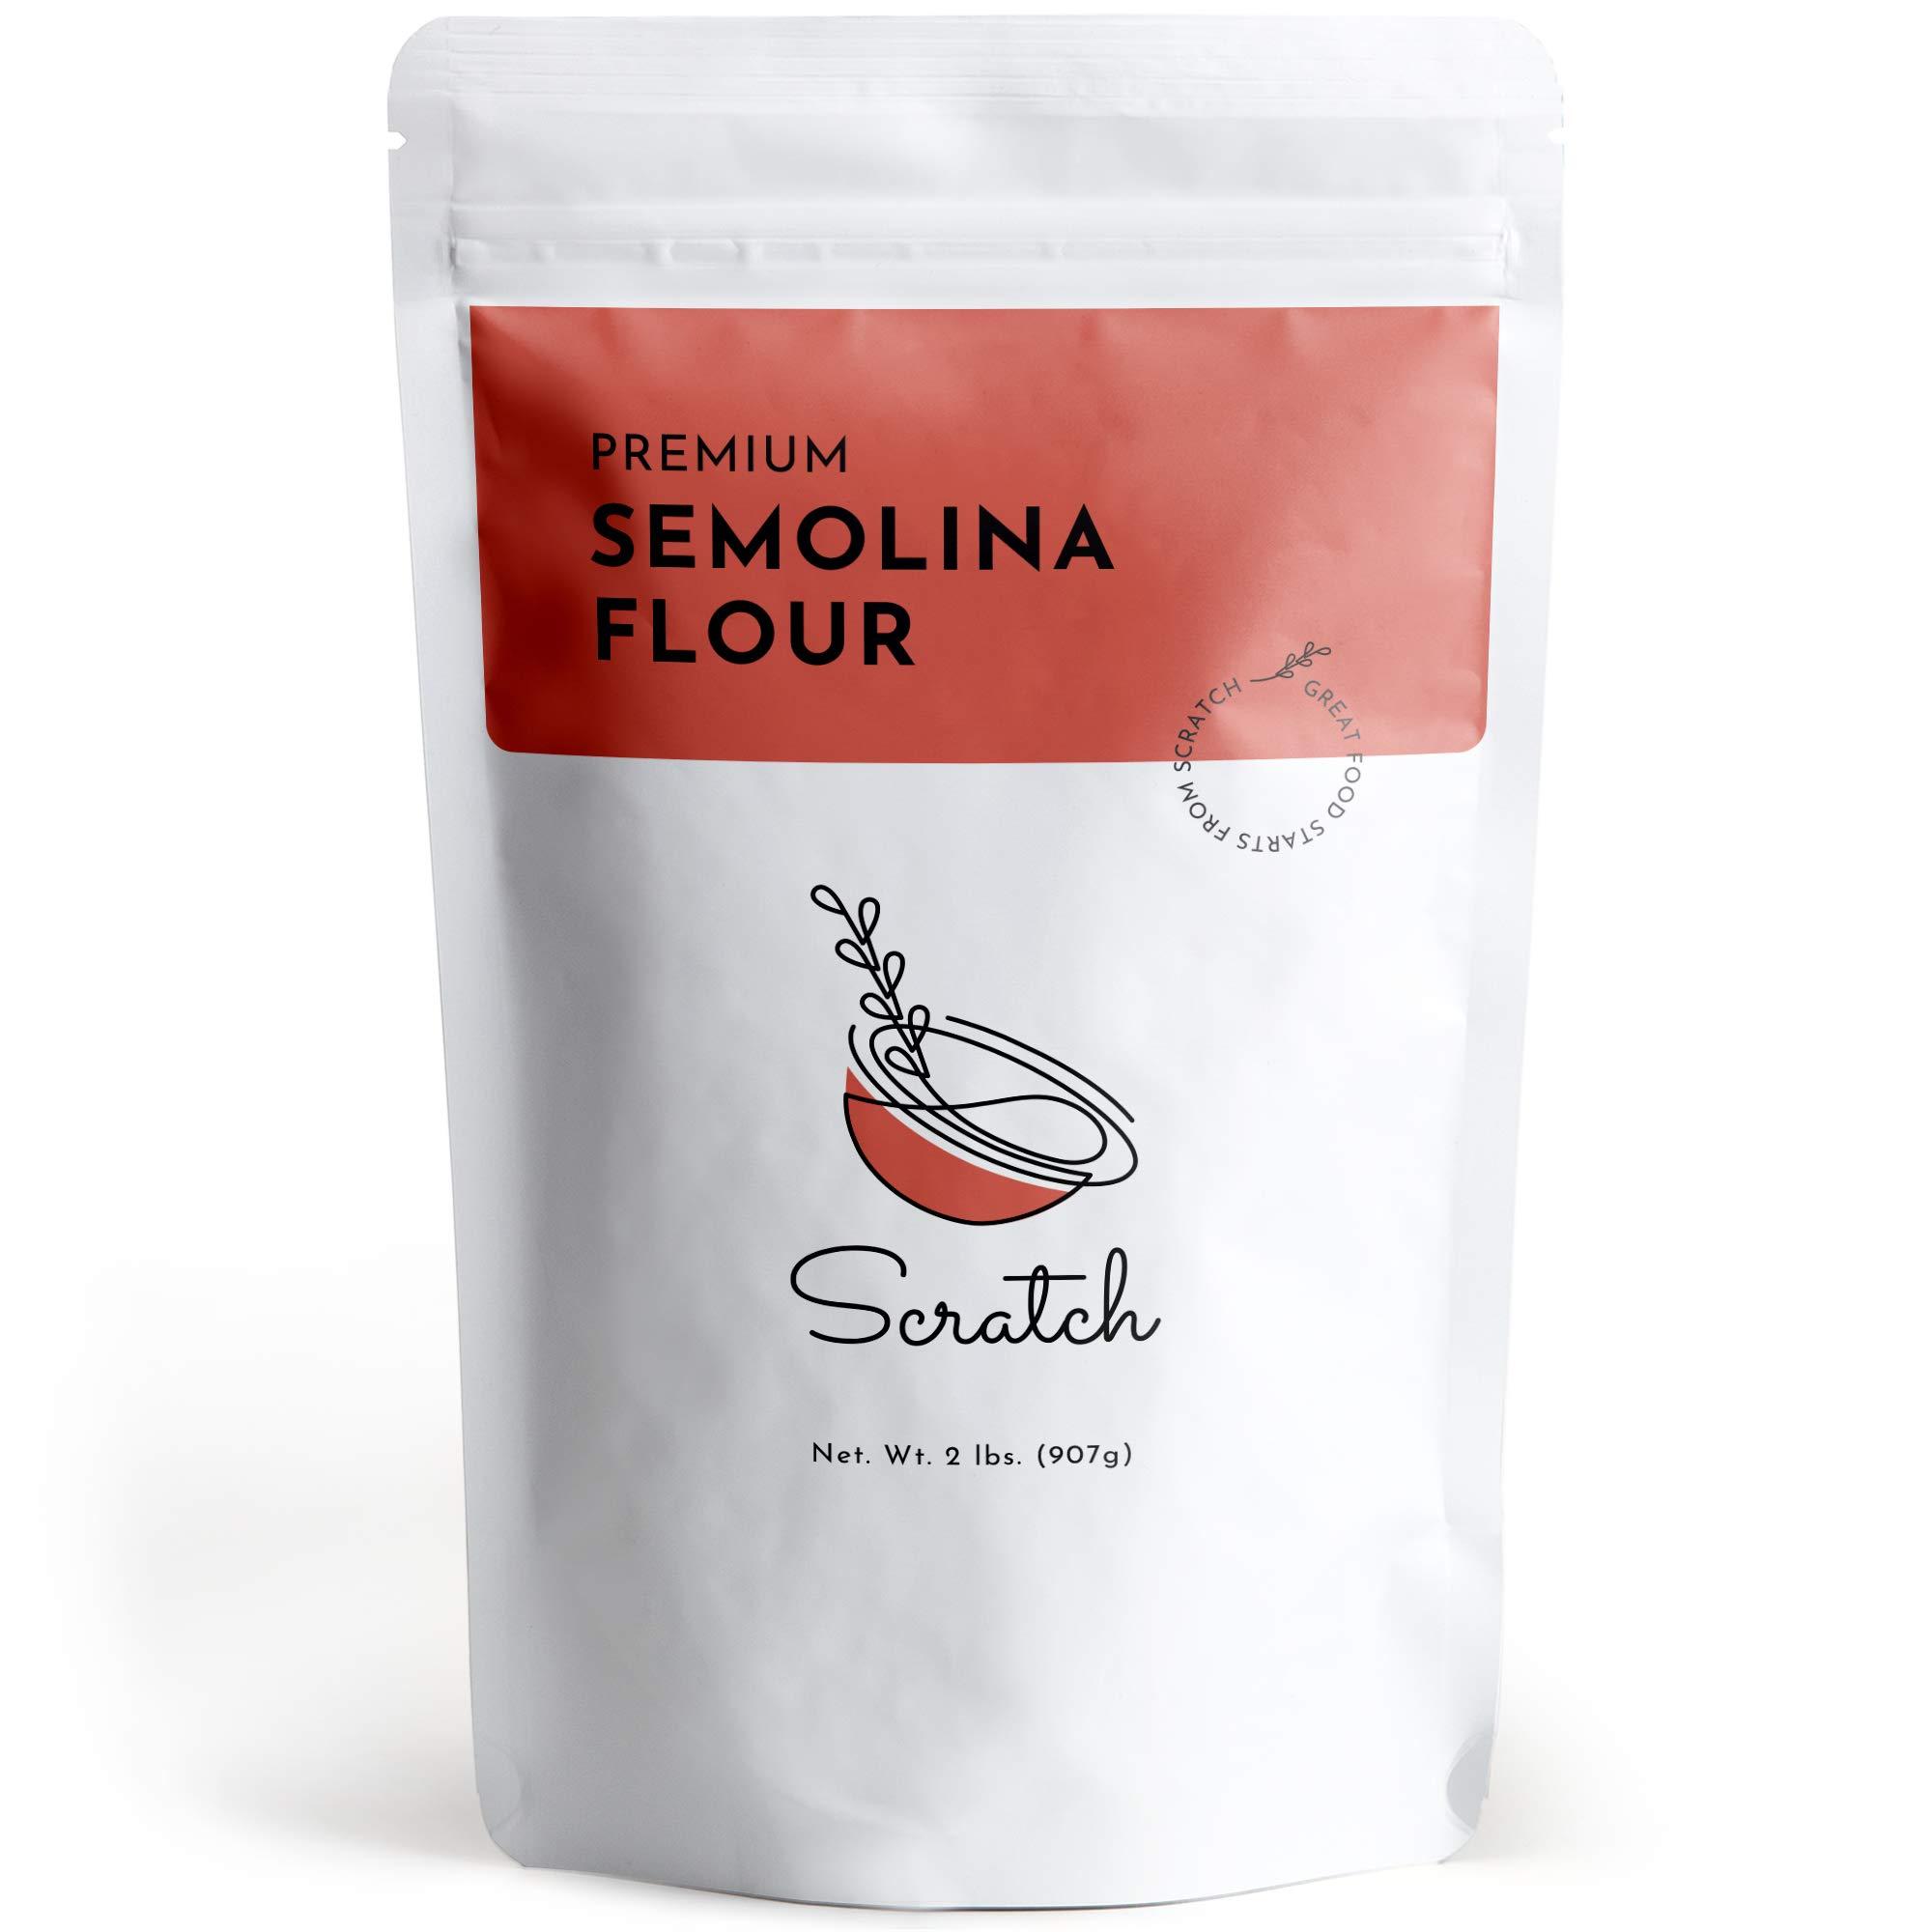 Scratch No.1 Durum Semolina Flour - (2 LB) Fine Semolina Flour for Pasta, Pizza Dough, Cake Flour and Bread Flour, 100% Fine Ground All-Natural Durum Wheat